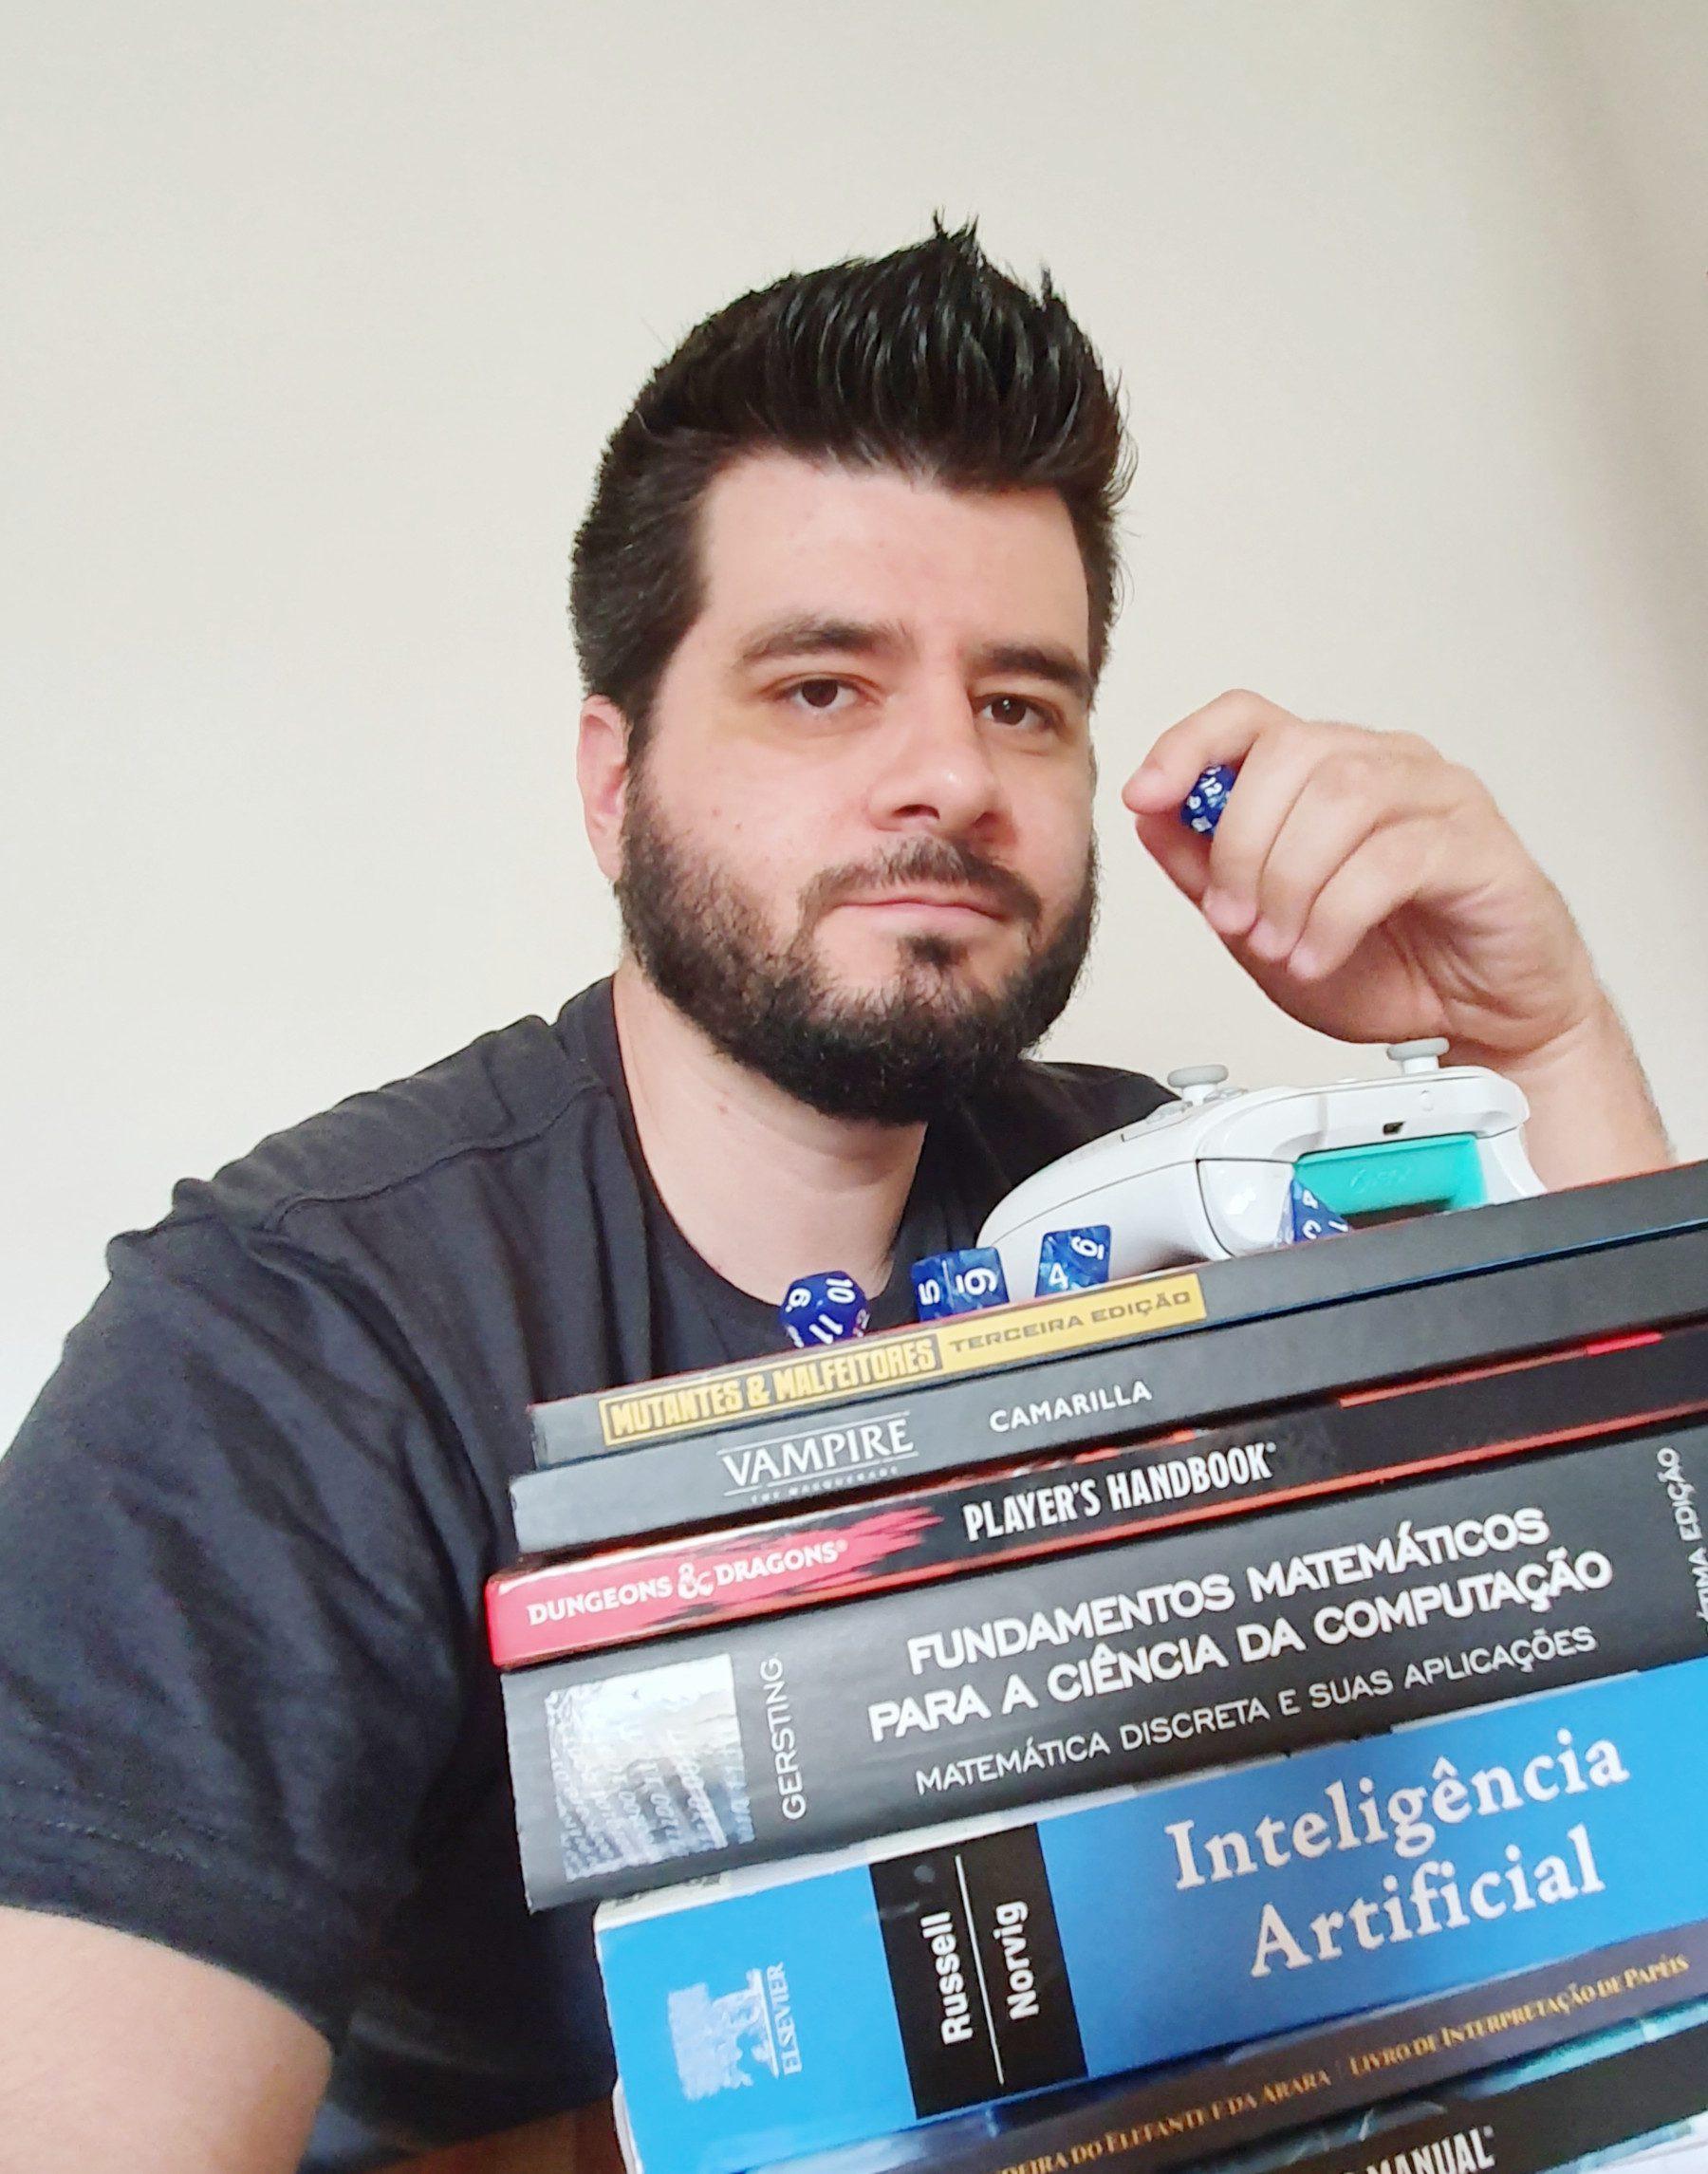 Developer Stories: Alysson Cunha Speaks On His Firecast 8 Entertainment Software